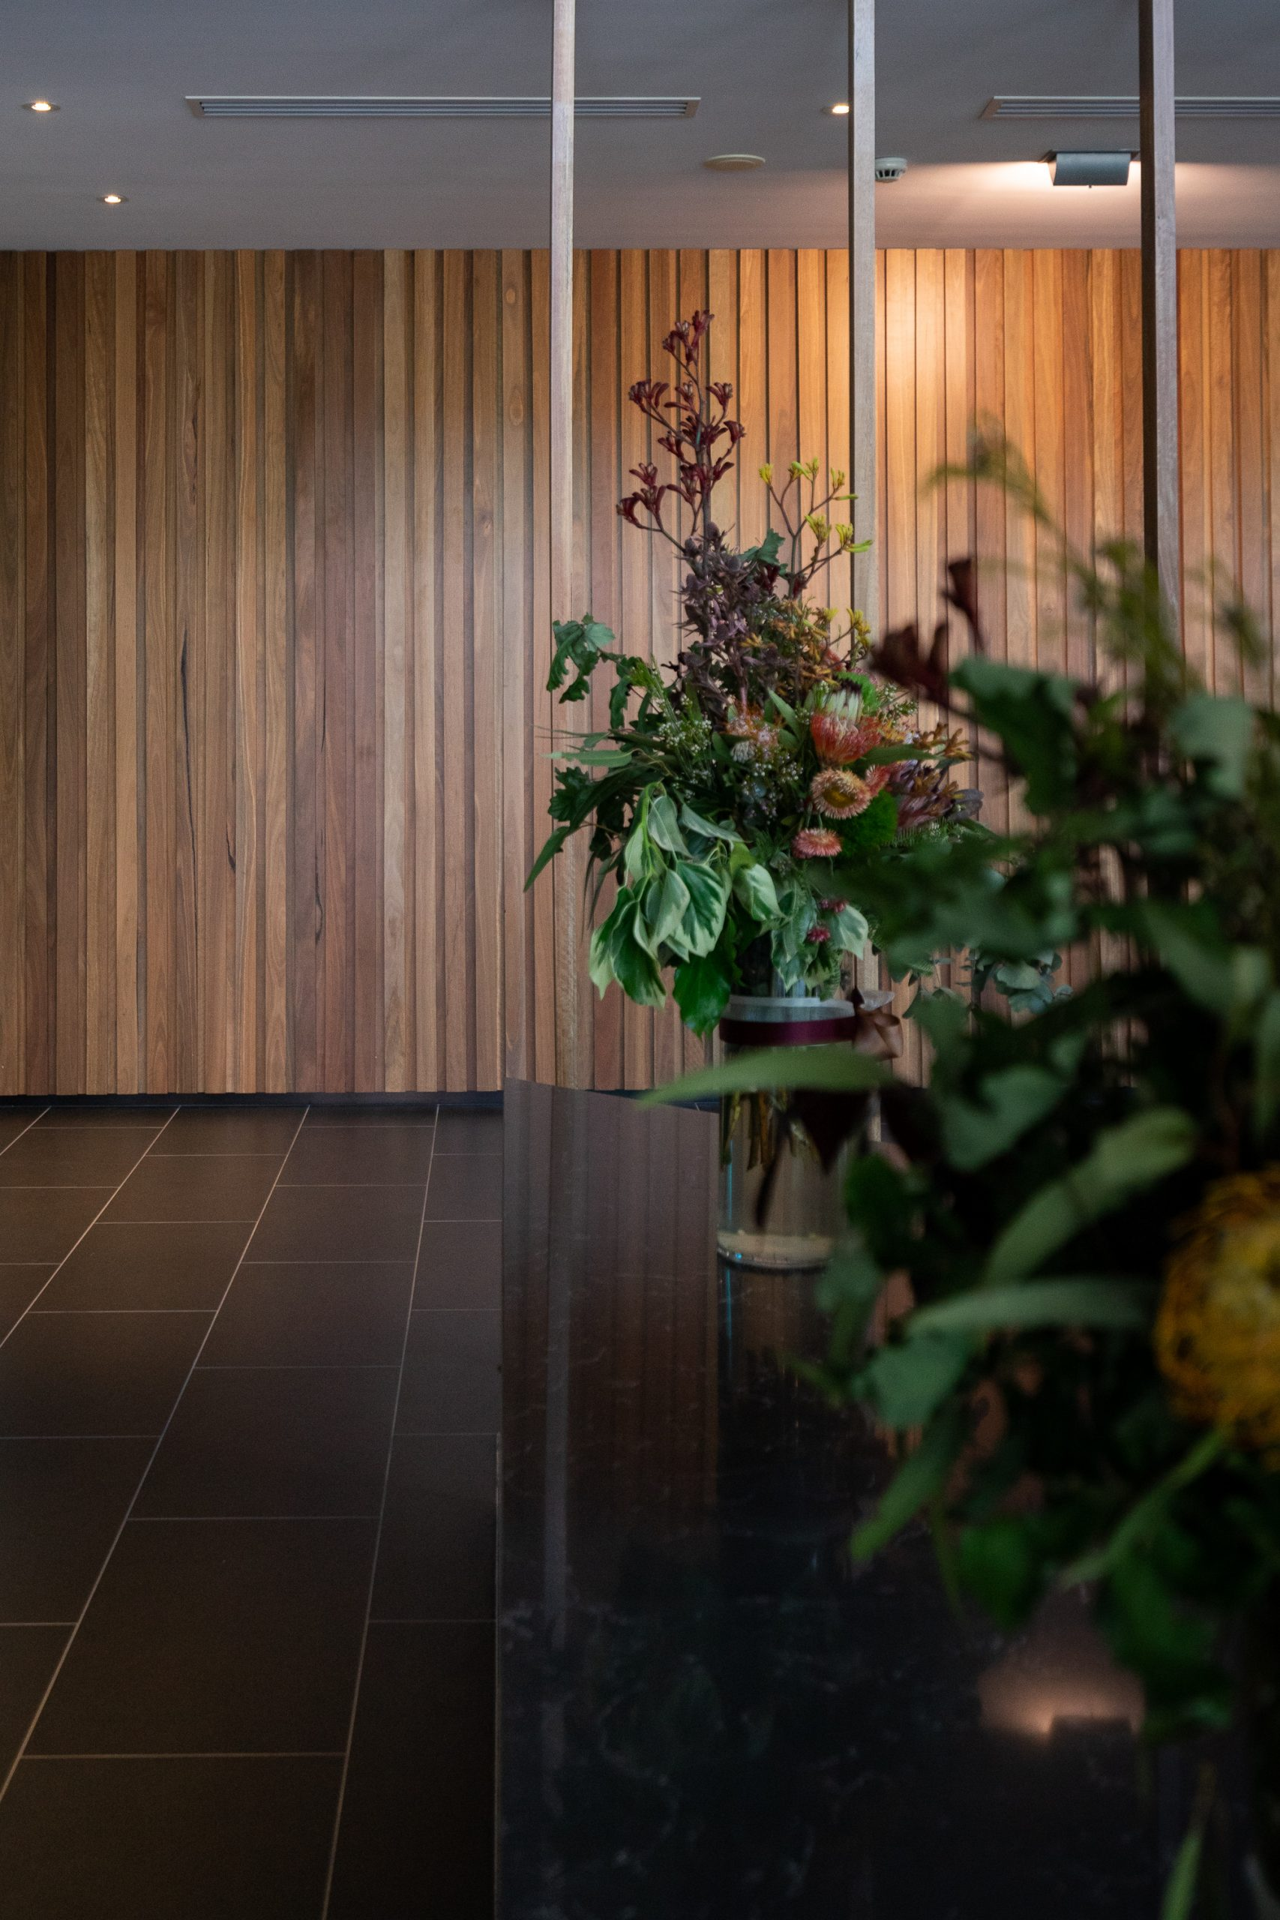 Indoor plants inside a building